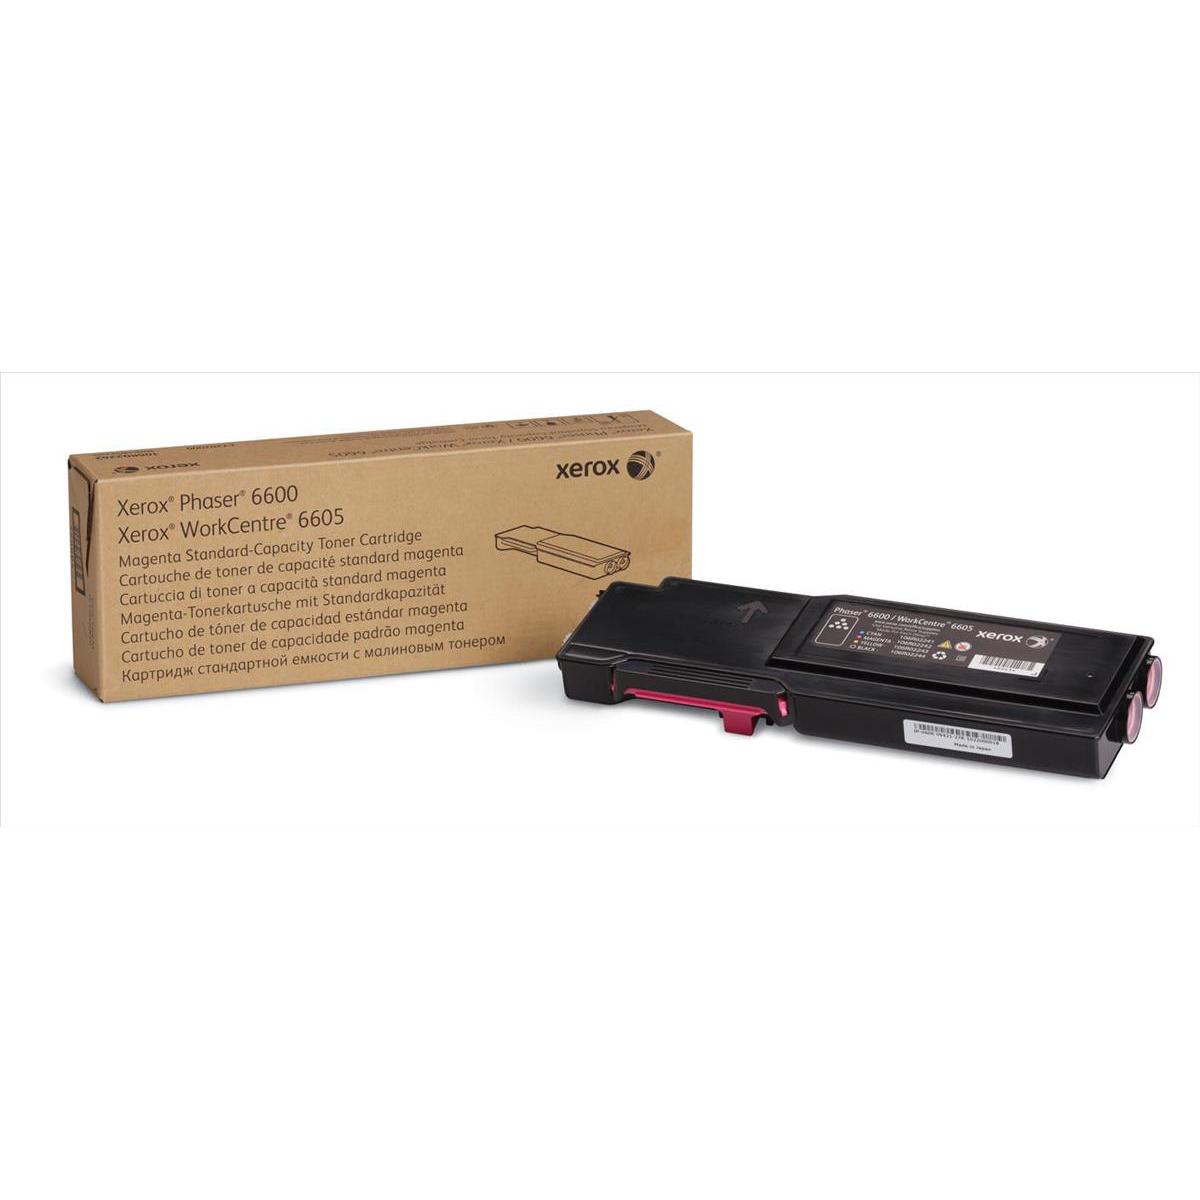 Xerox Phaser 6600 Toner Cartridge Page Life 2000pp Magenta Ref 106R02246